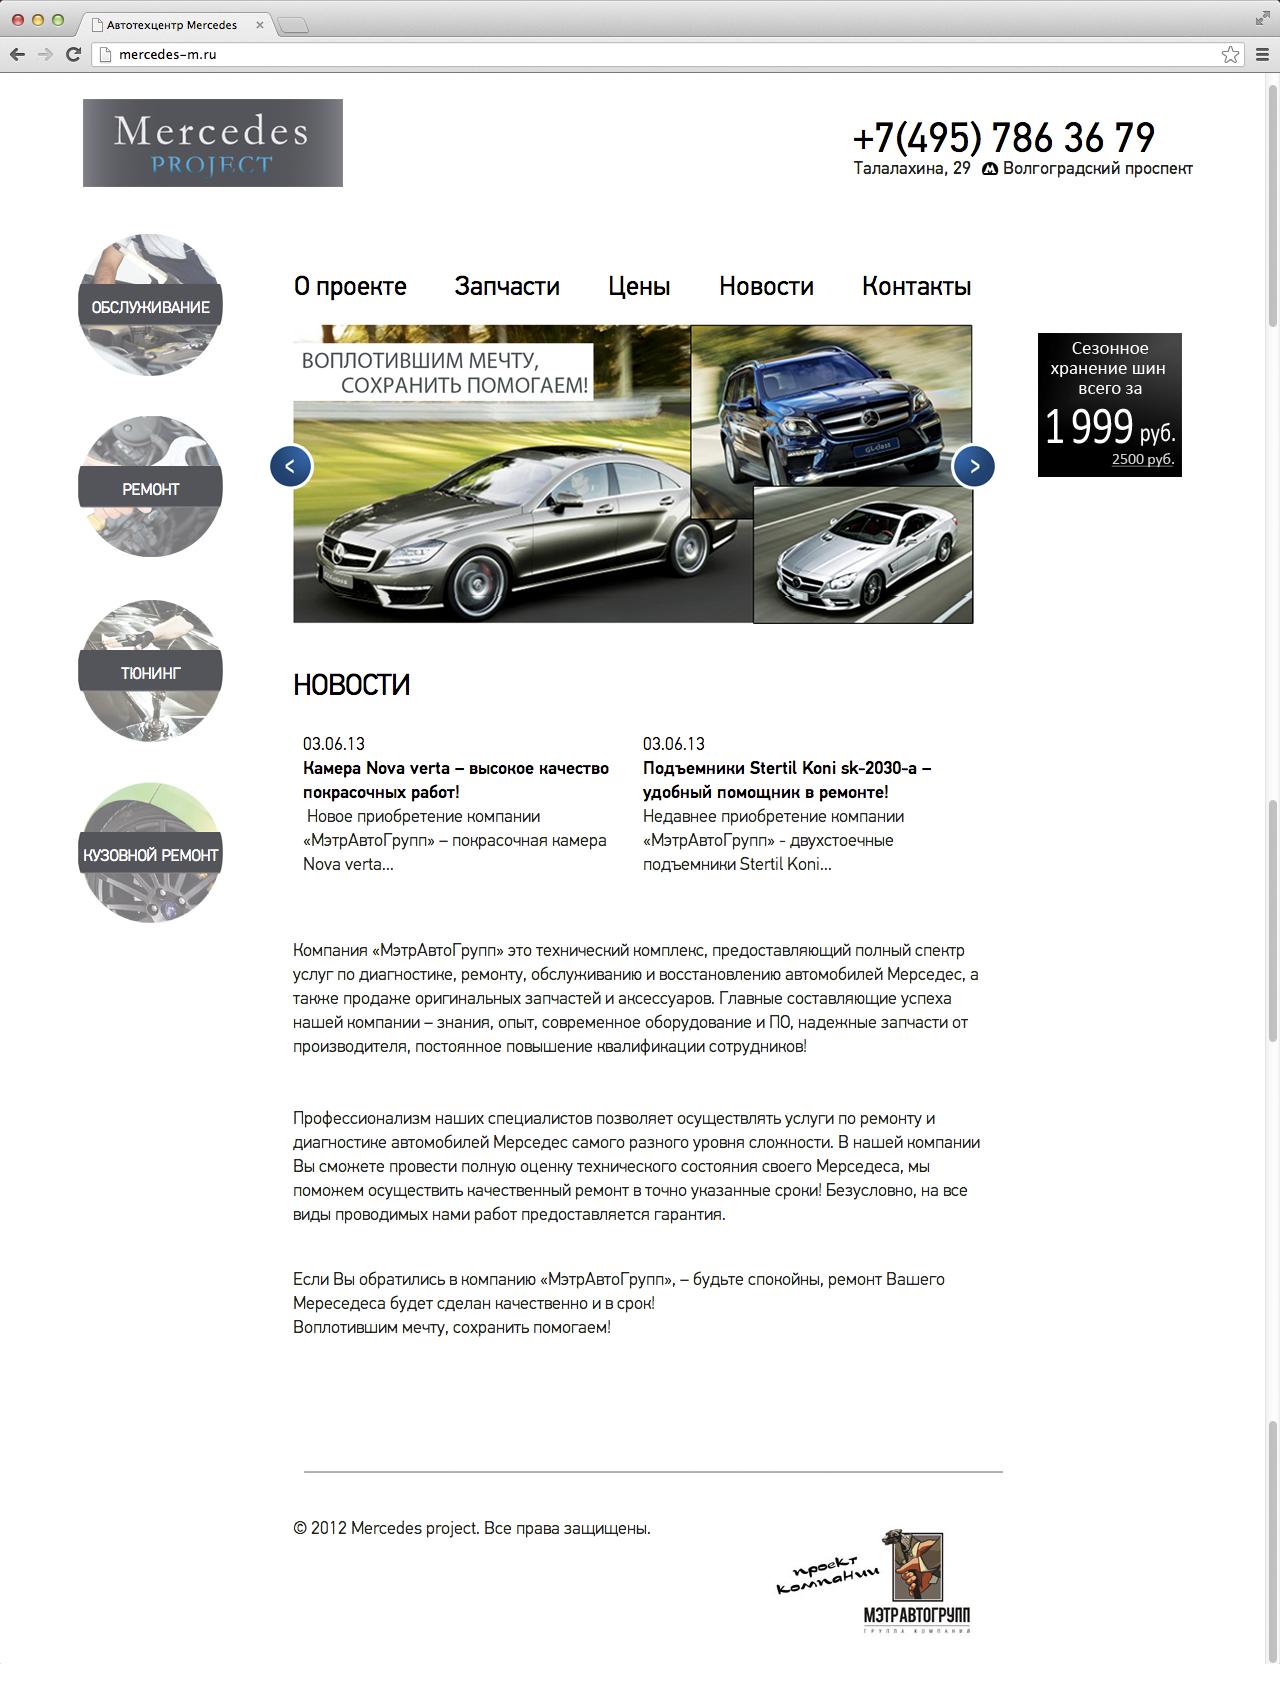 Автотехцентр Mercedes-M